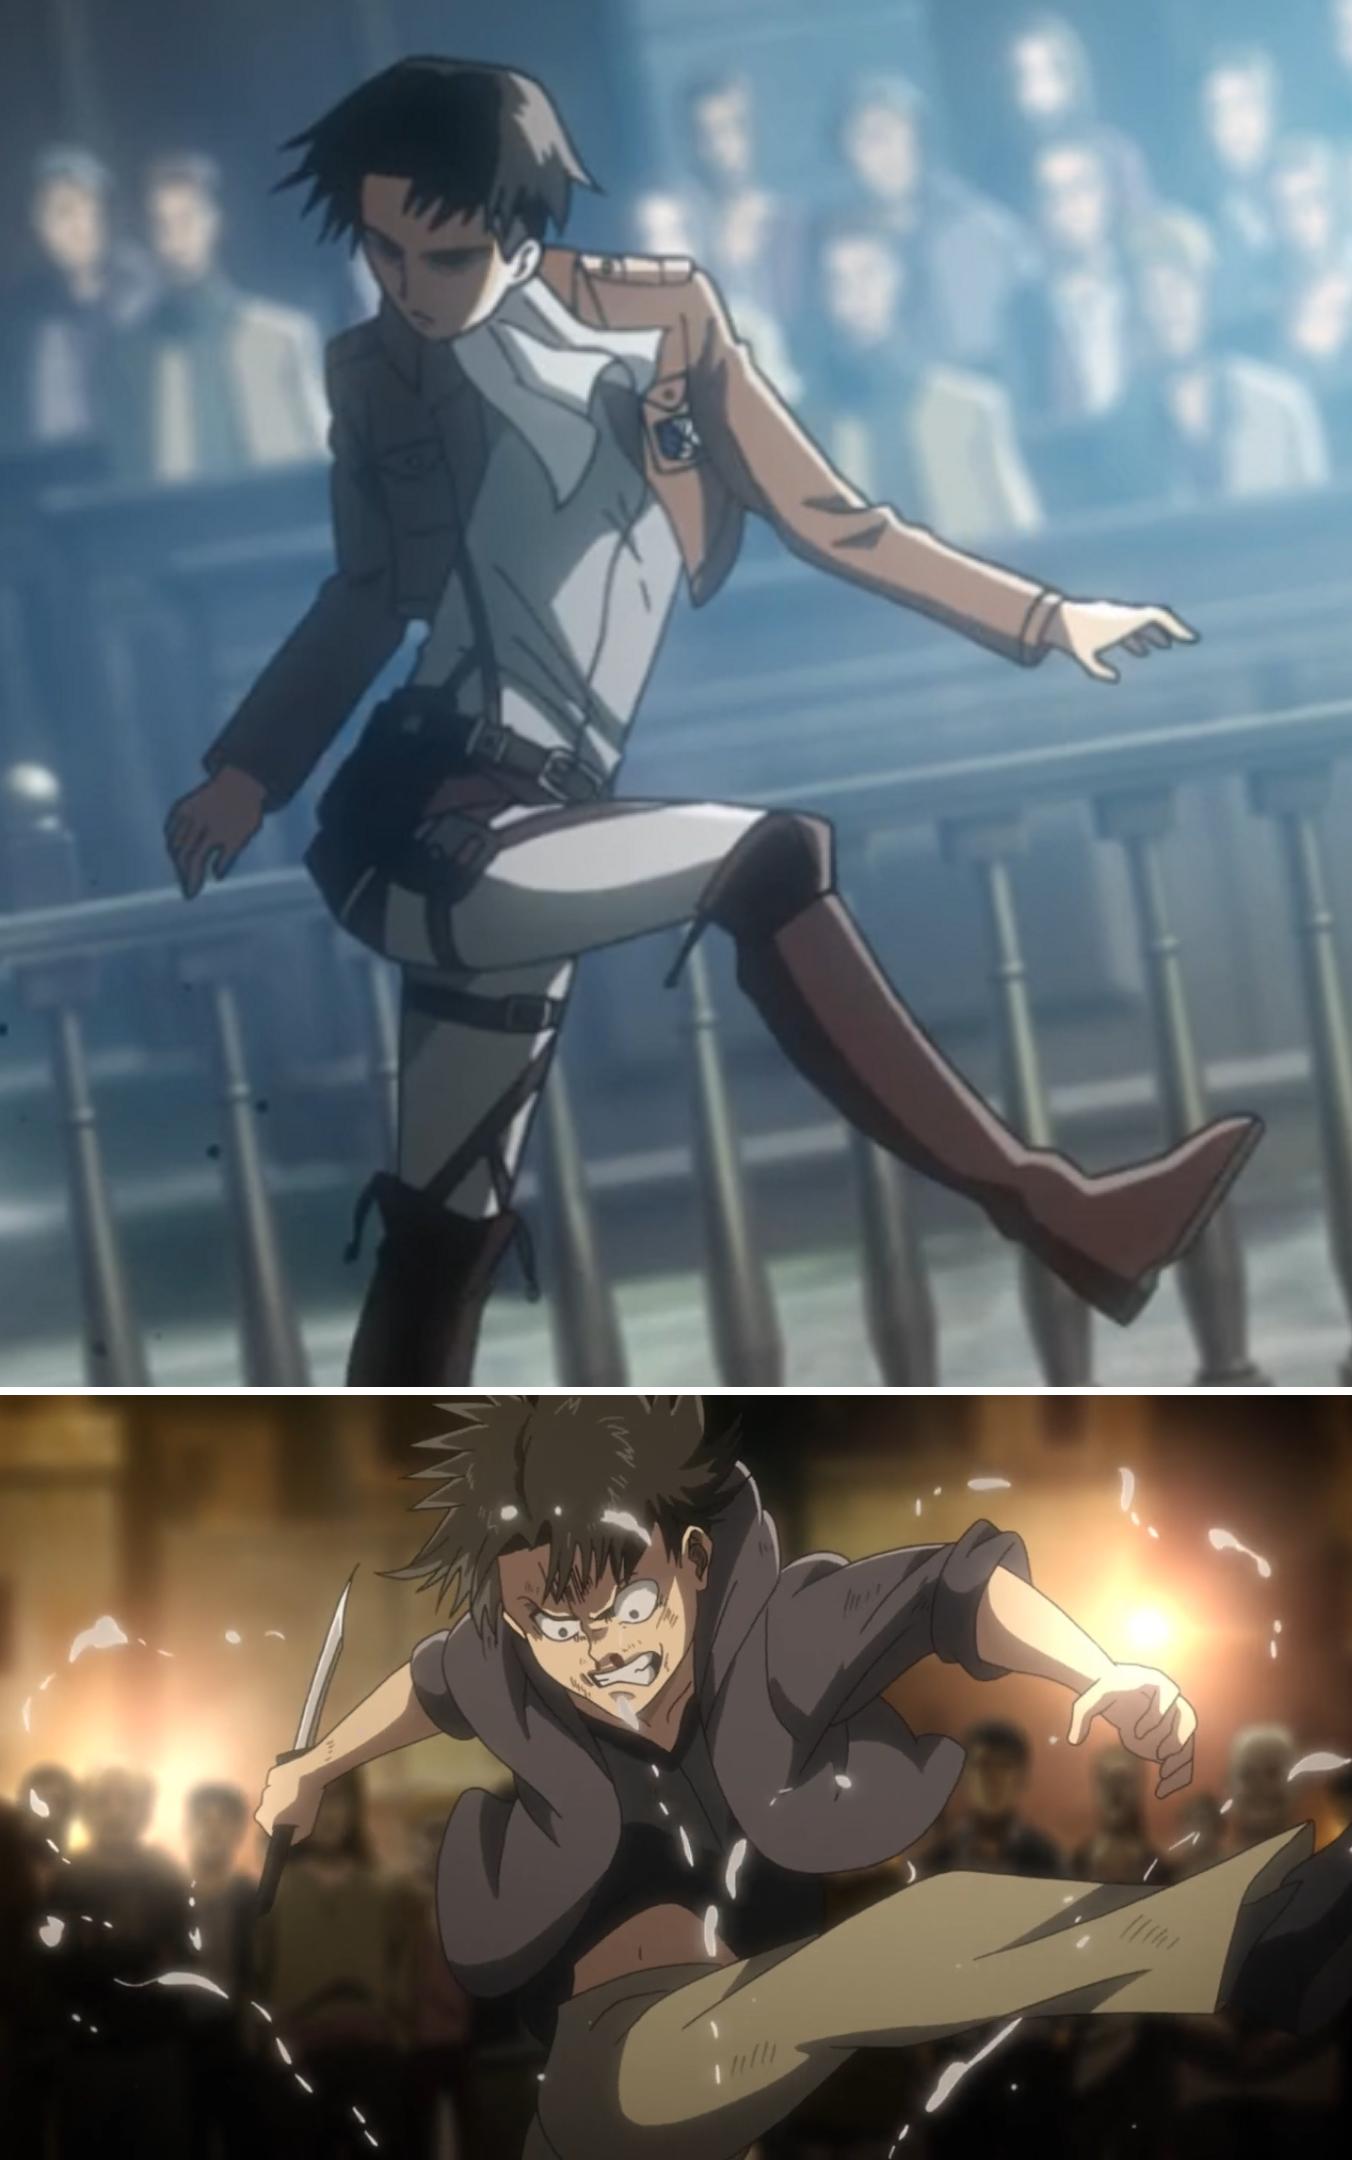 Mic Drop Attack On Titan Meme Attack On Titan Anime Attack On